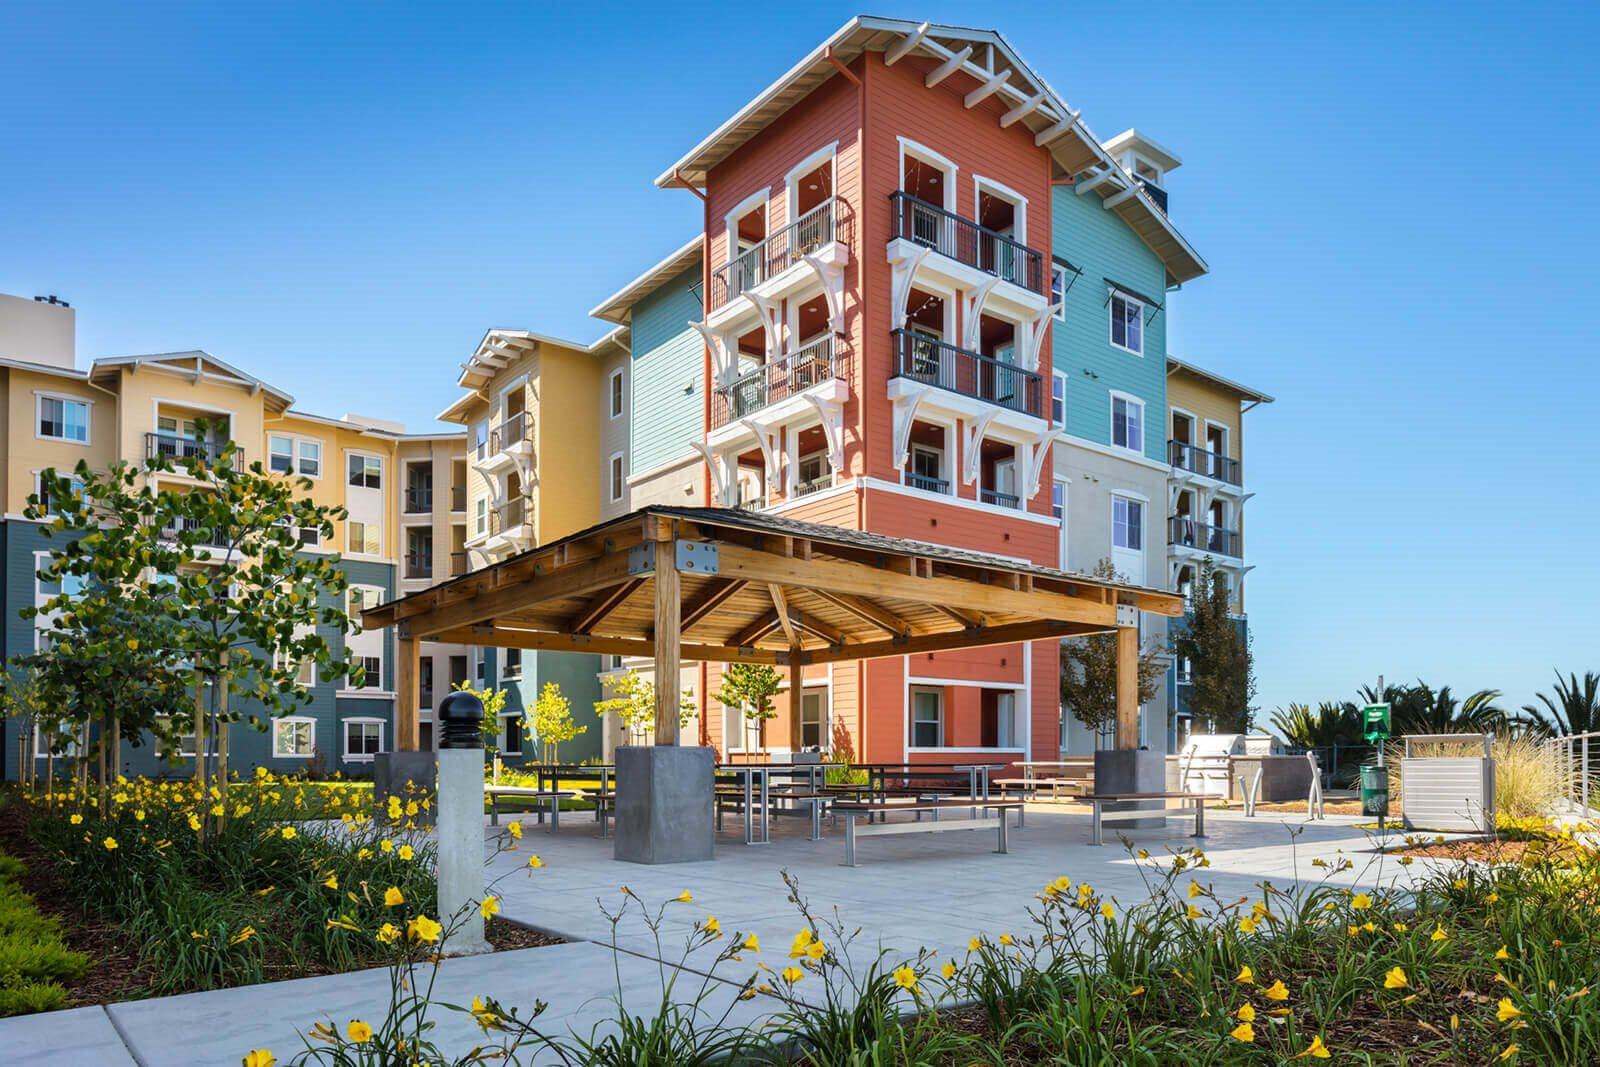 Outdoor Gazebo at Blu Harbor by Windsor, Redwood City, California